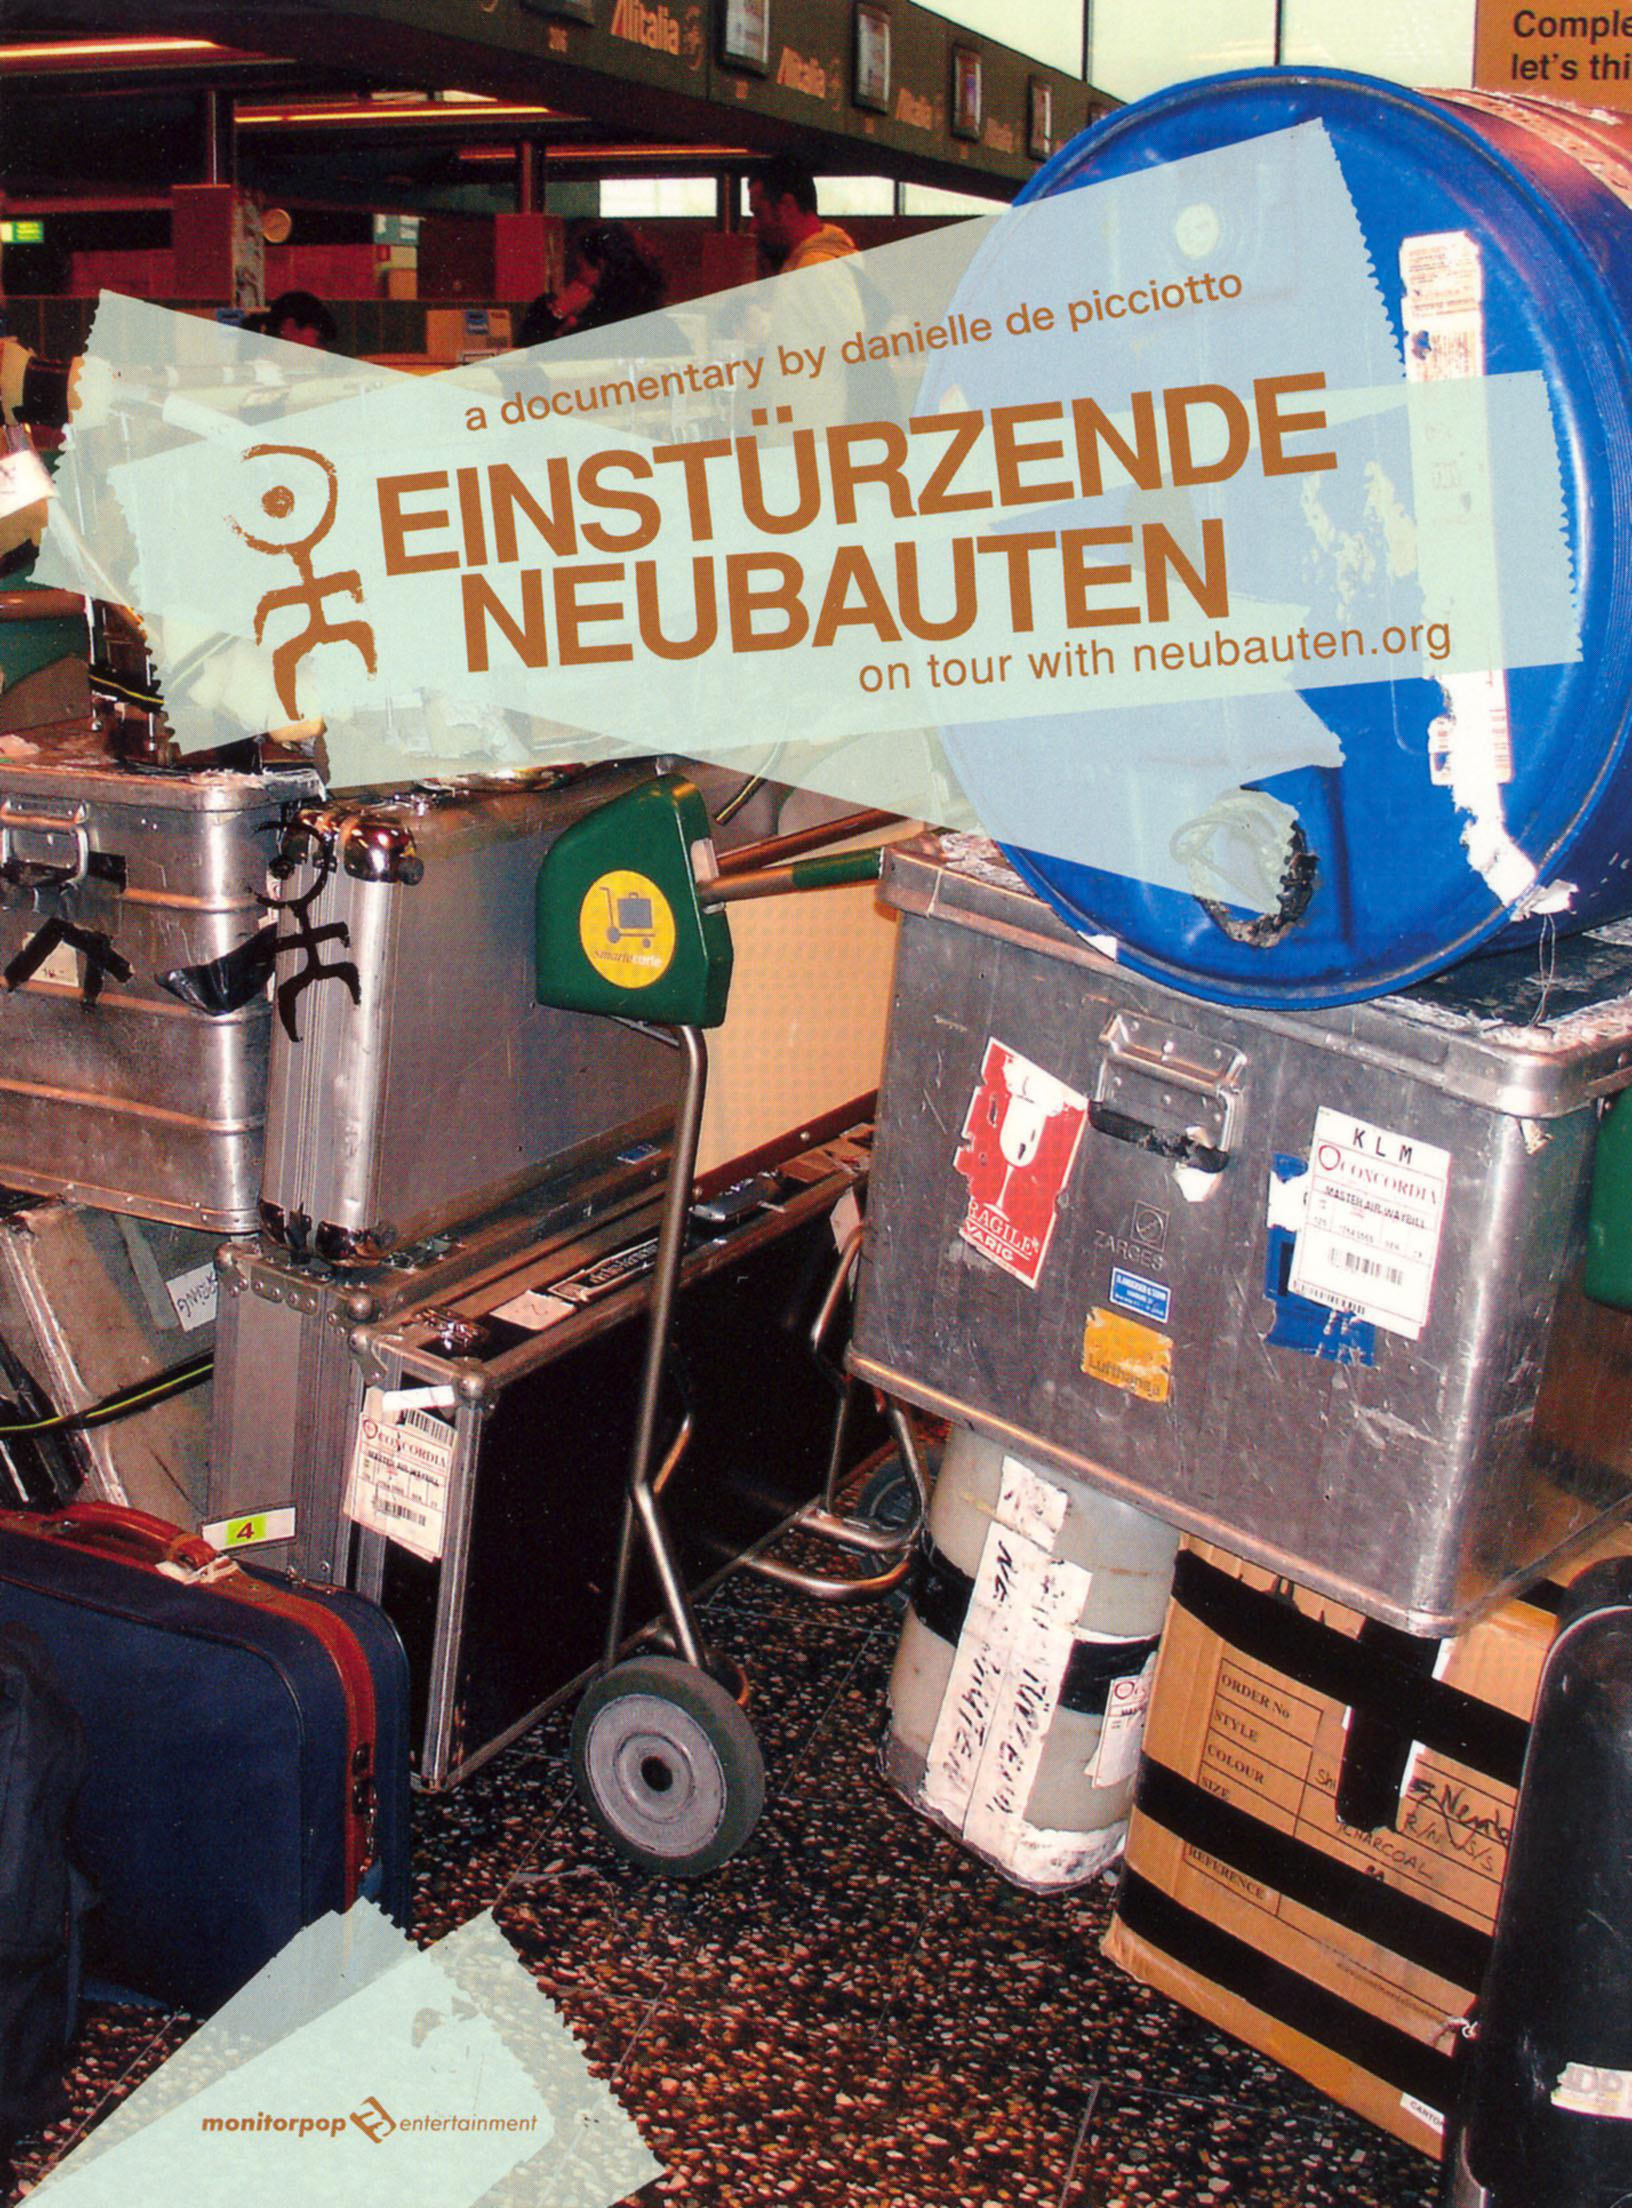 Einstürzende Neubauten: On Tour with Neubauten.org